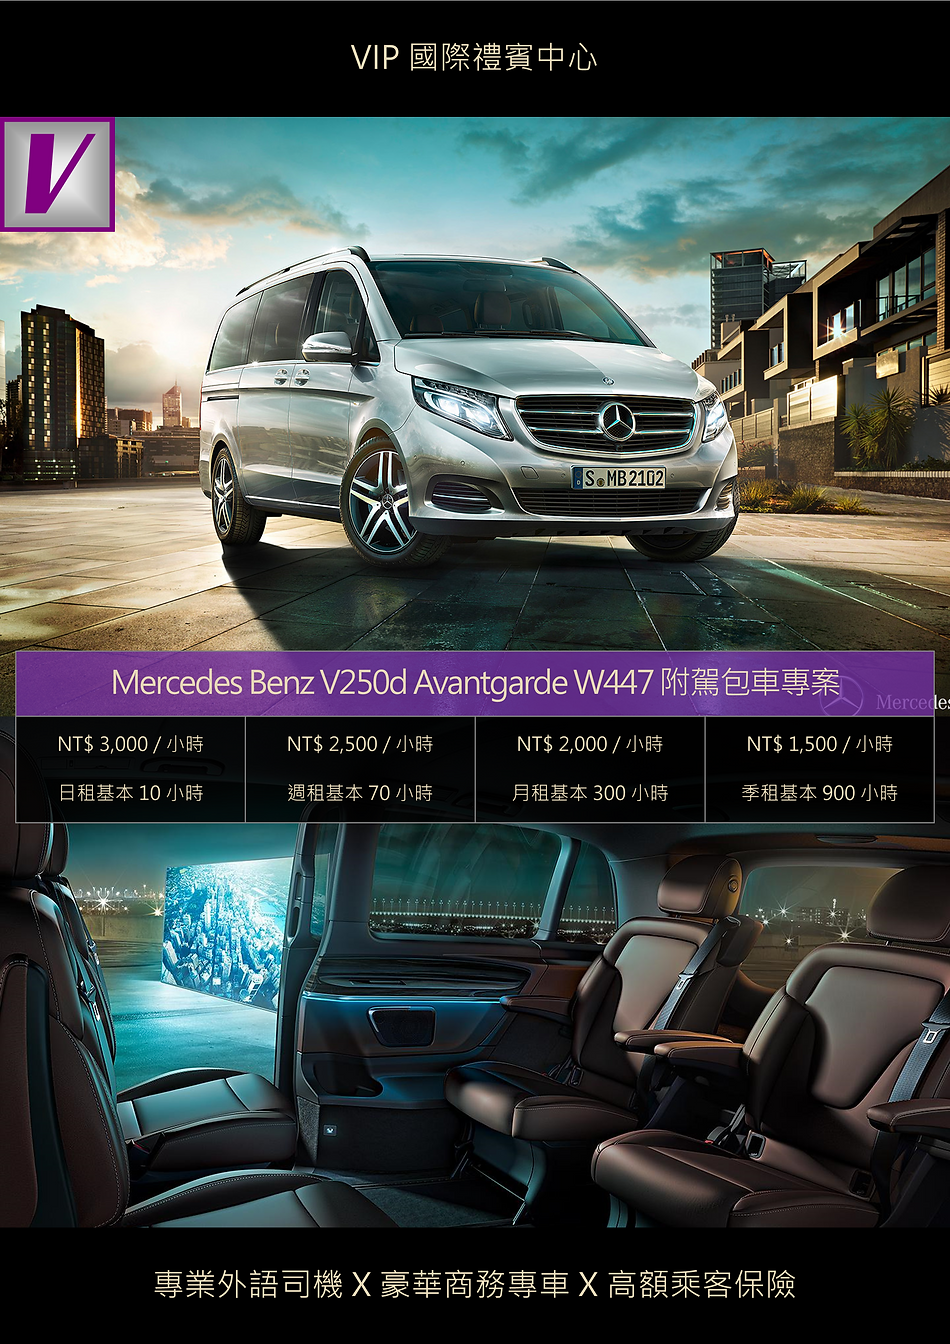 VIP國際禮賓中心 MERCEDES BENZ V250D AVANTGARDE W447 附駕包車專案 DM.png